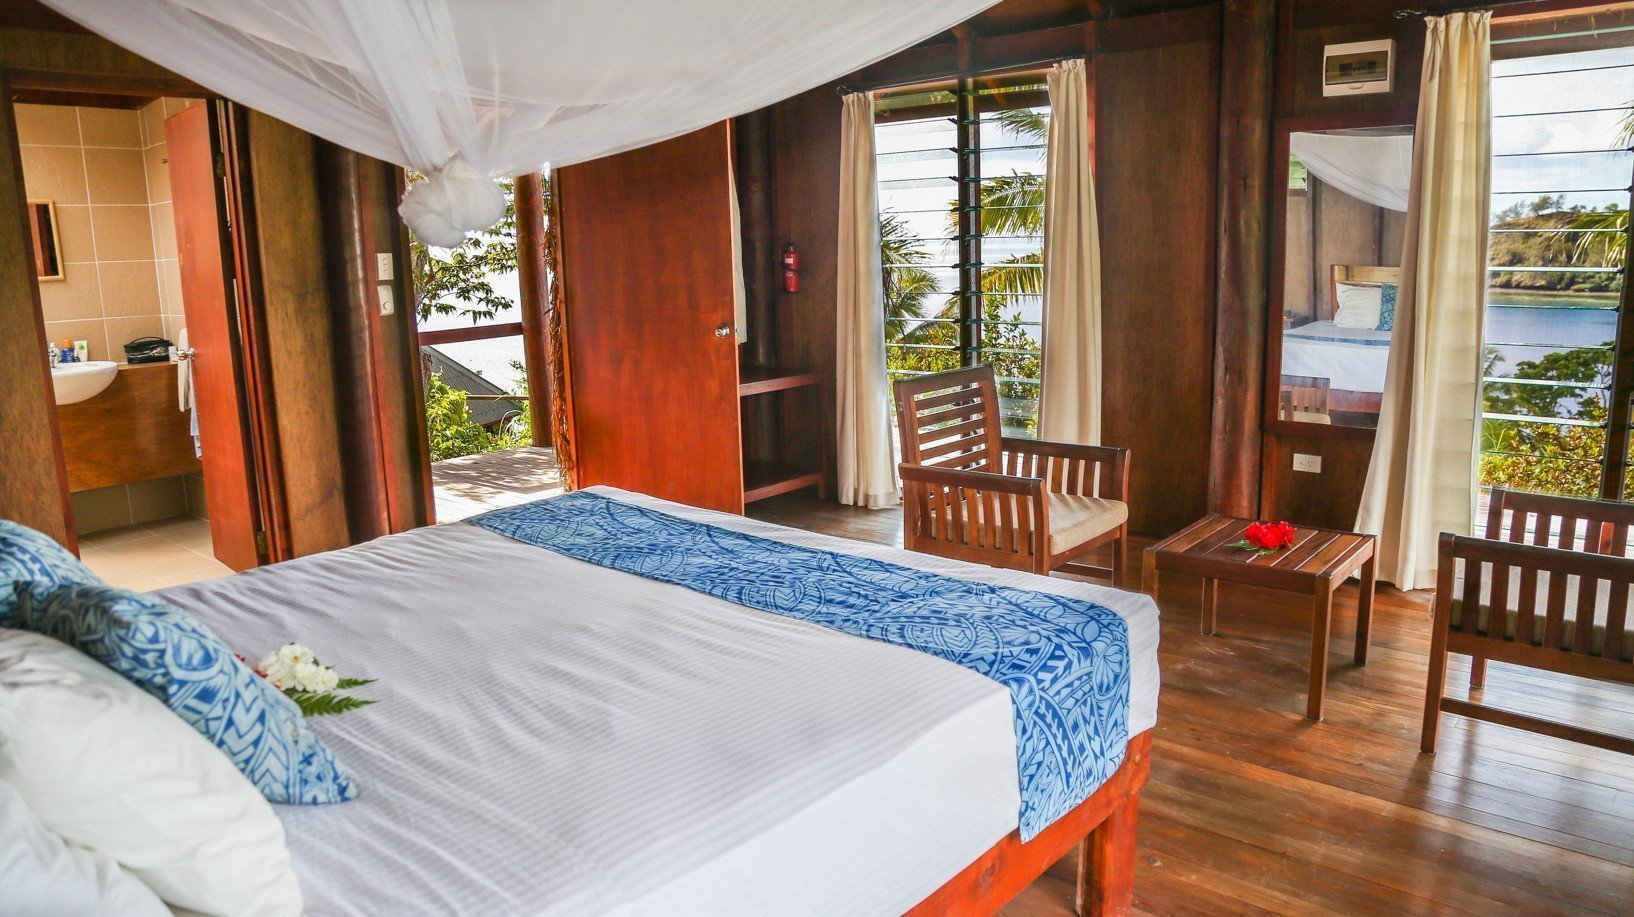 Matava guest room